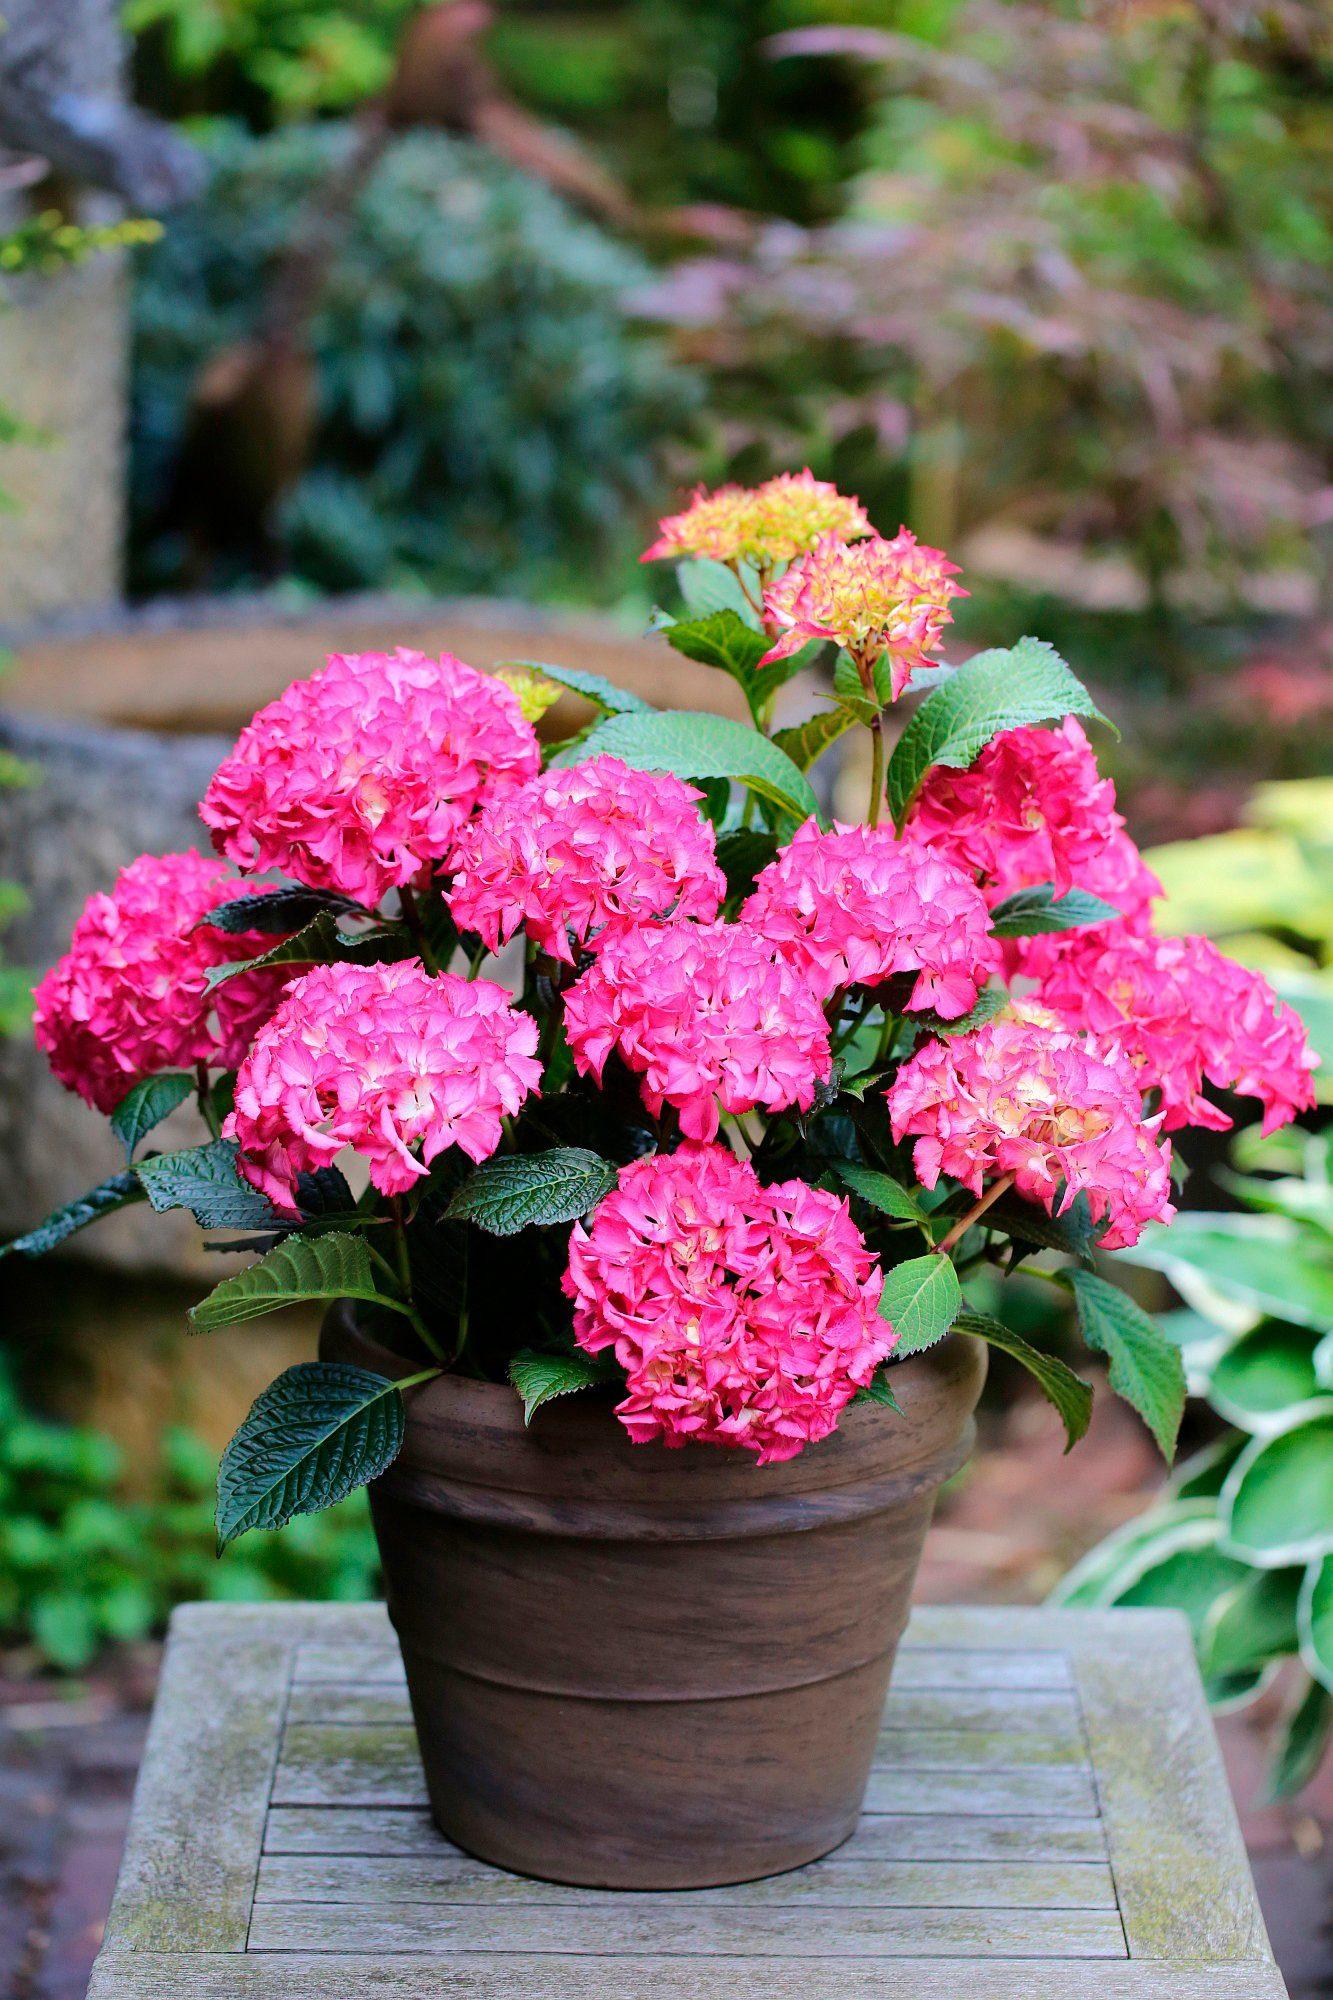 BCM Hortensie »Selma Pink«, Höhe: 30-40 cm, 2 Pflanze